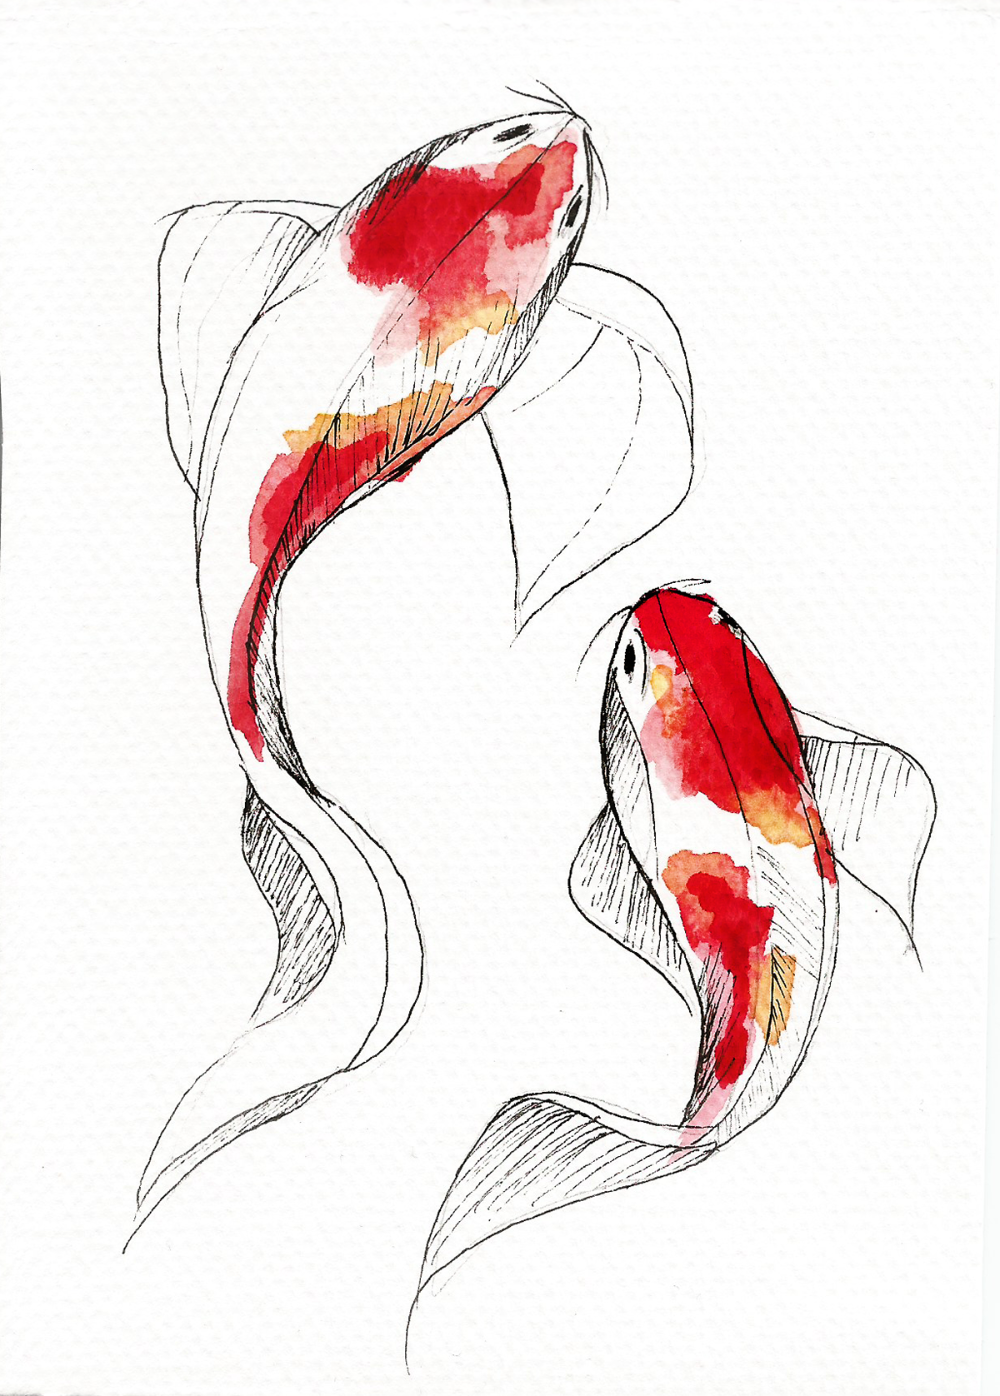 Watercolor Koi Fish on Behance